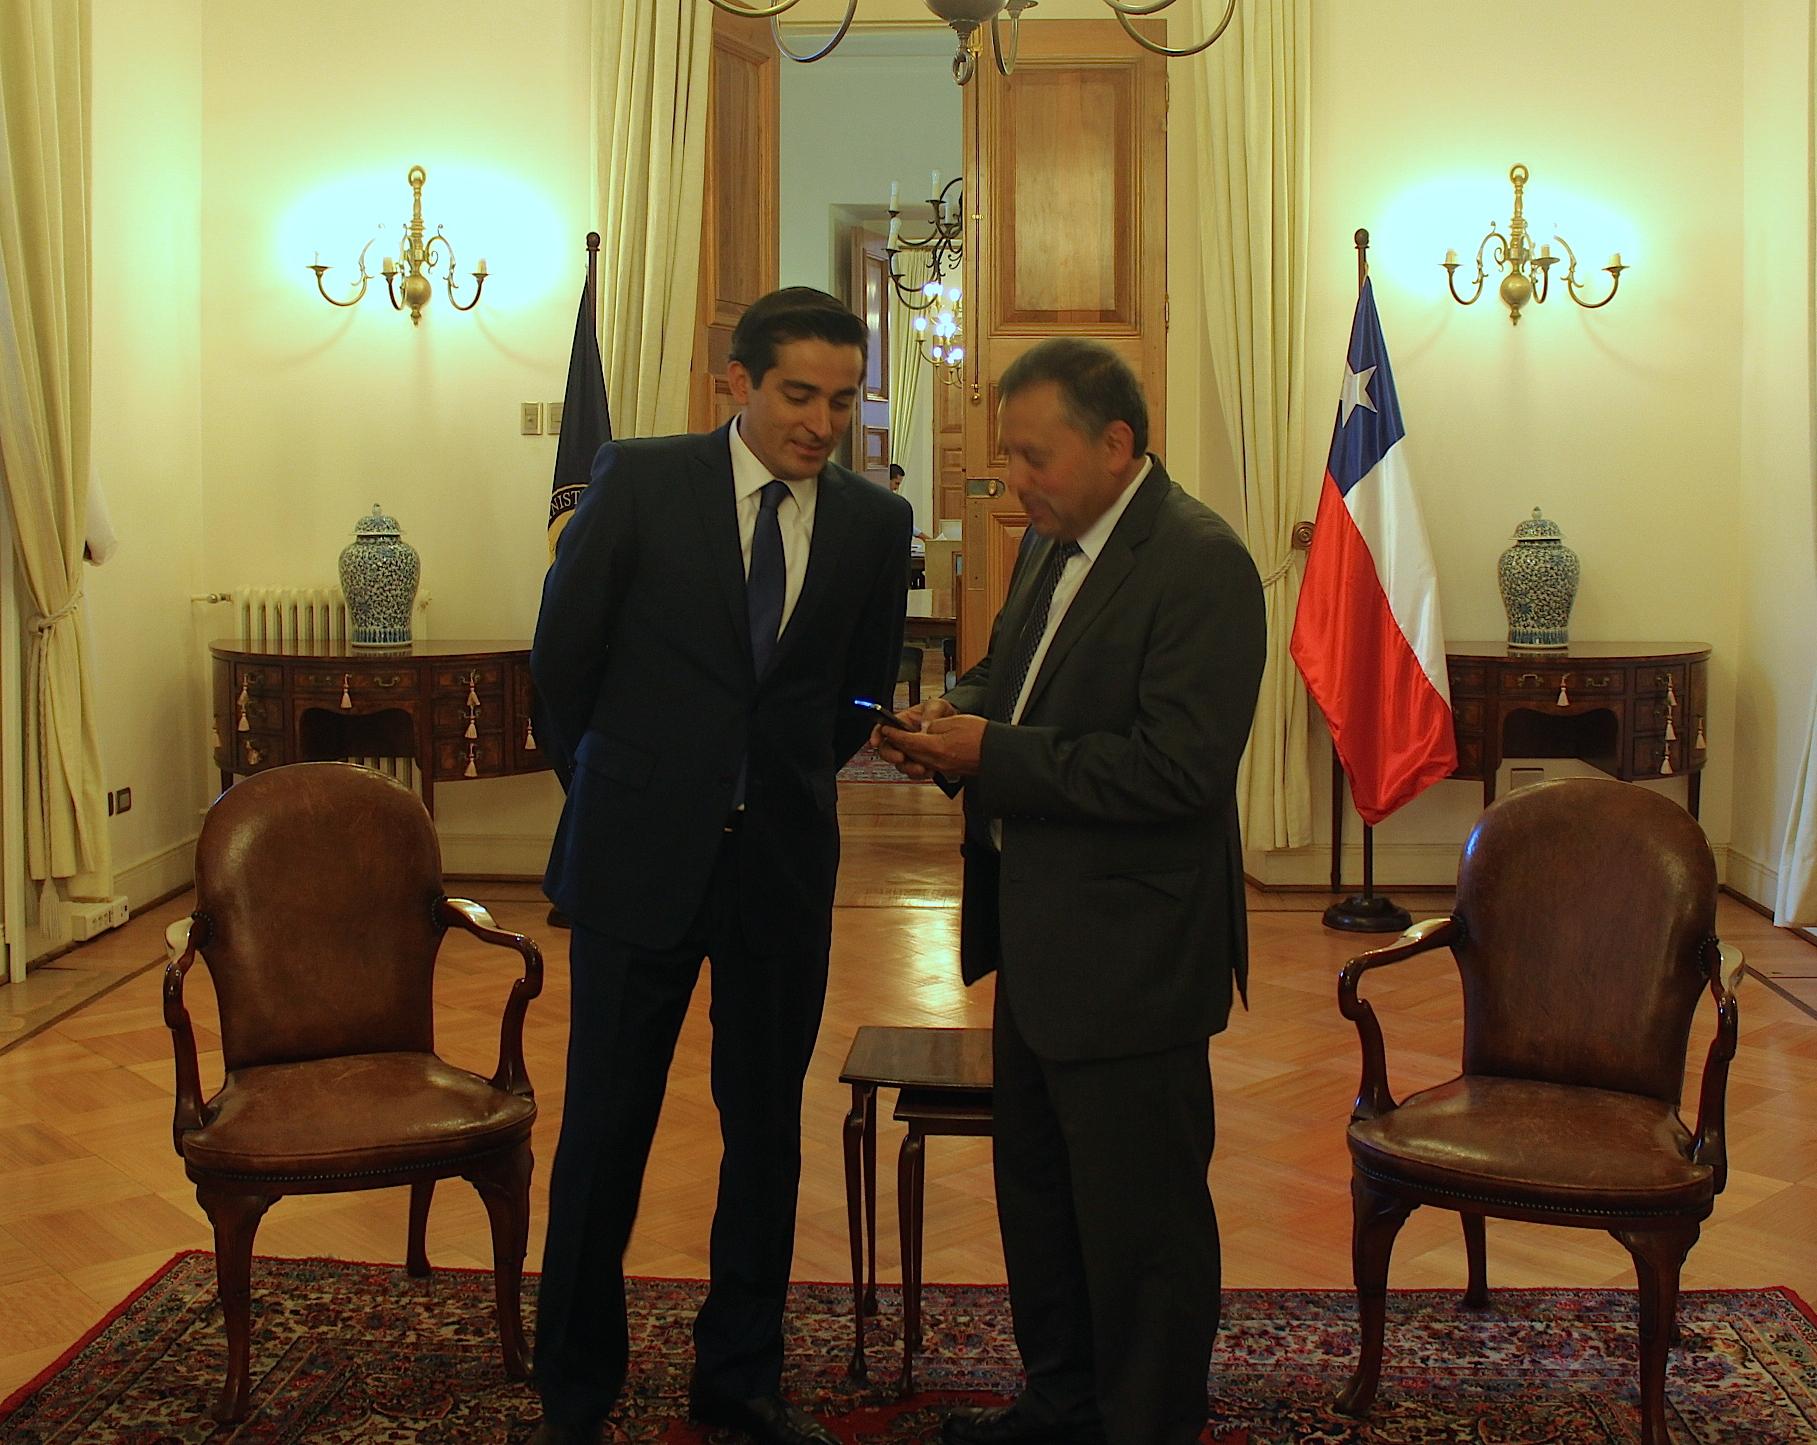 Ministro del interior anuncia visita presidencial a la for Escuchas ministro del interior